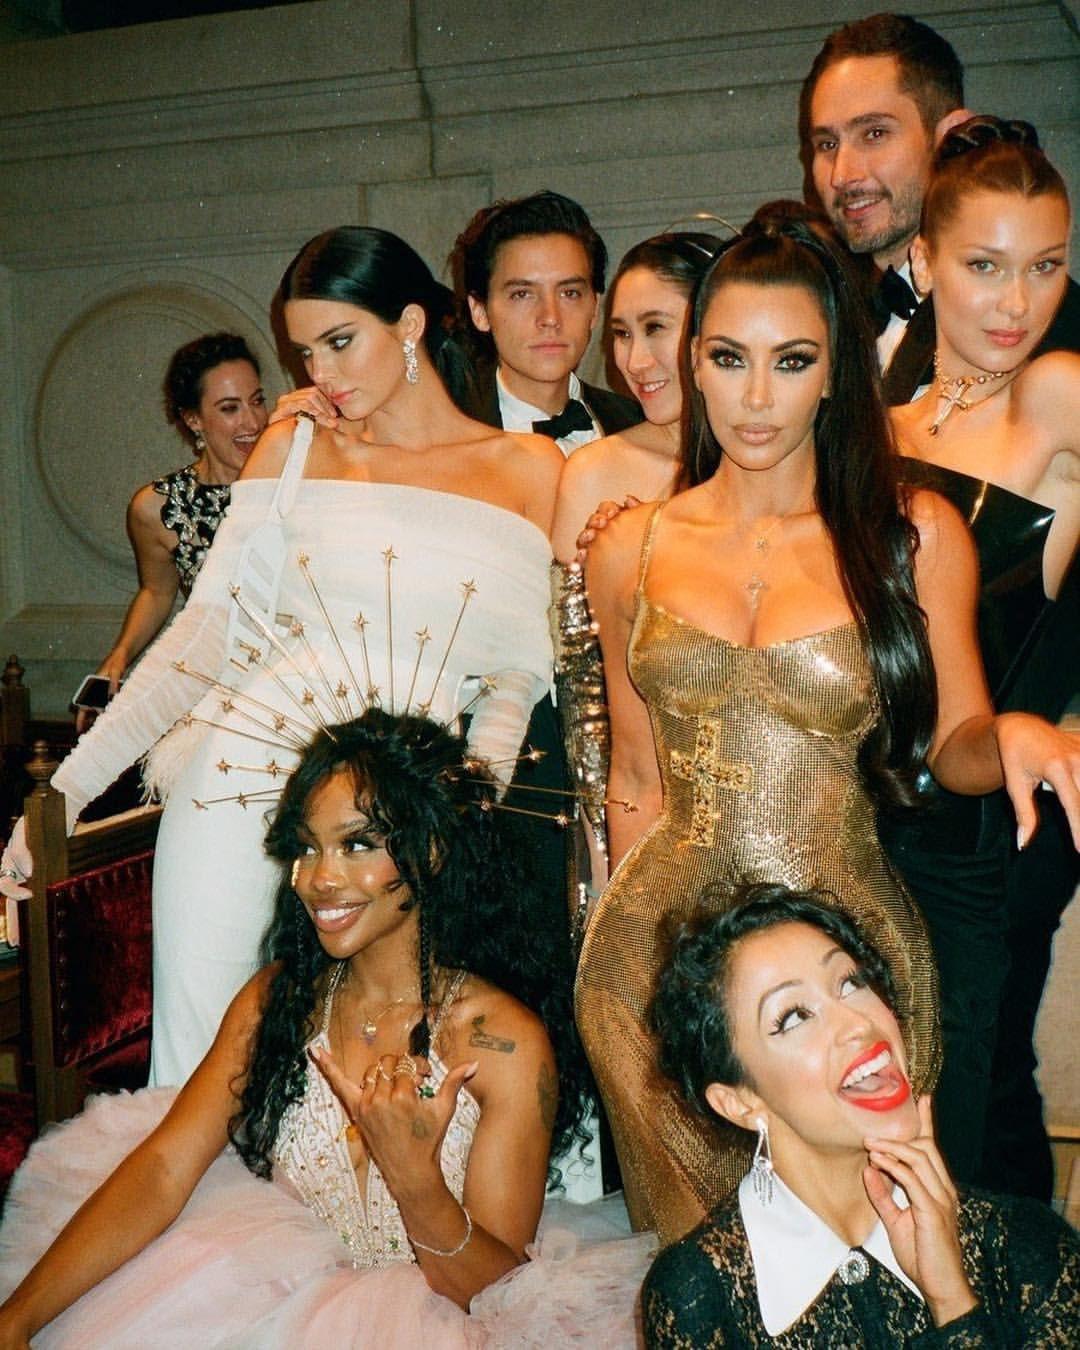 Bellahadid At The Met Gala With Kendalljenner Sza Kimkardashian Colesprouse And Lizakoshy Met Gala 2018 Met Gala Kendall Jenner Met Gala